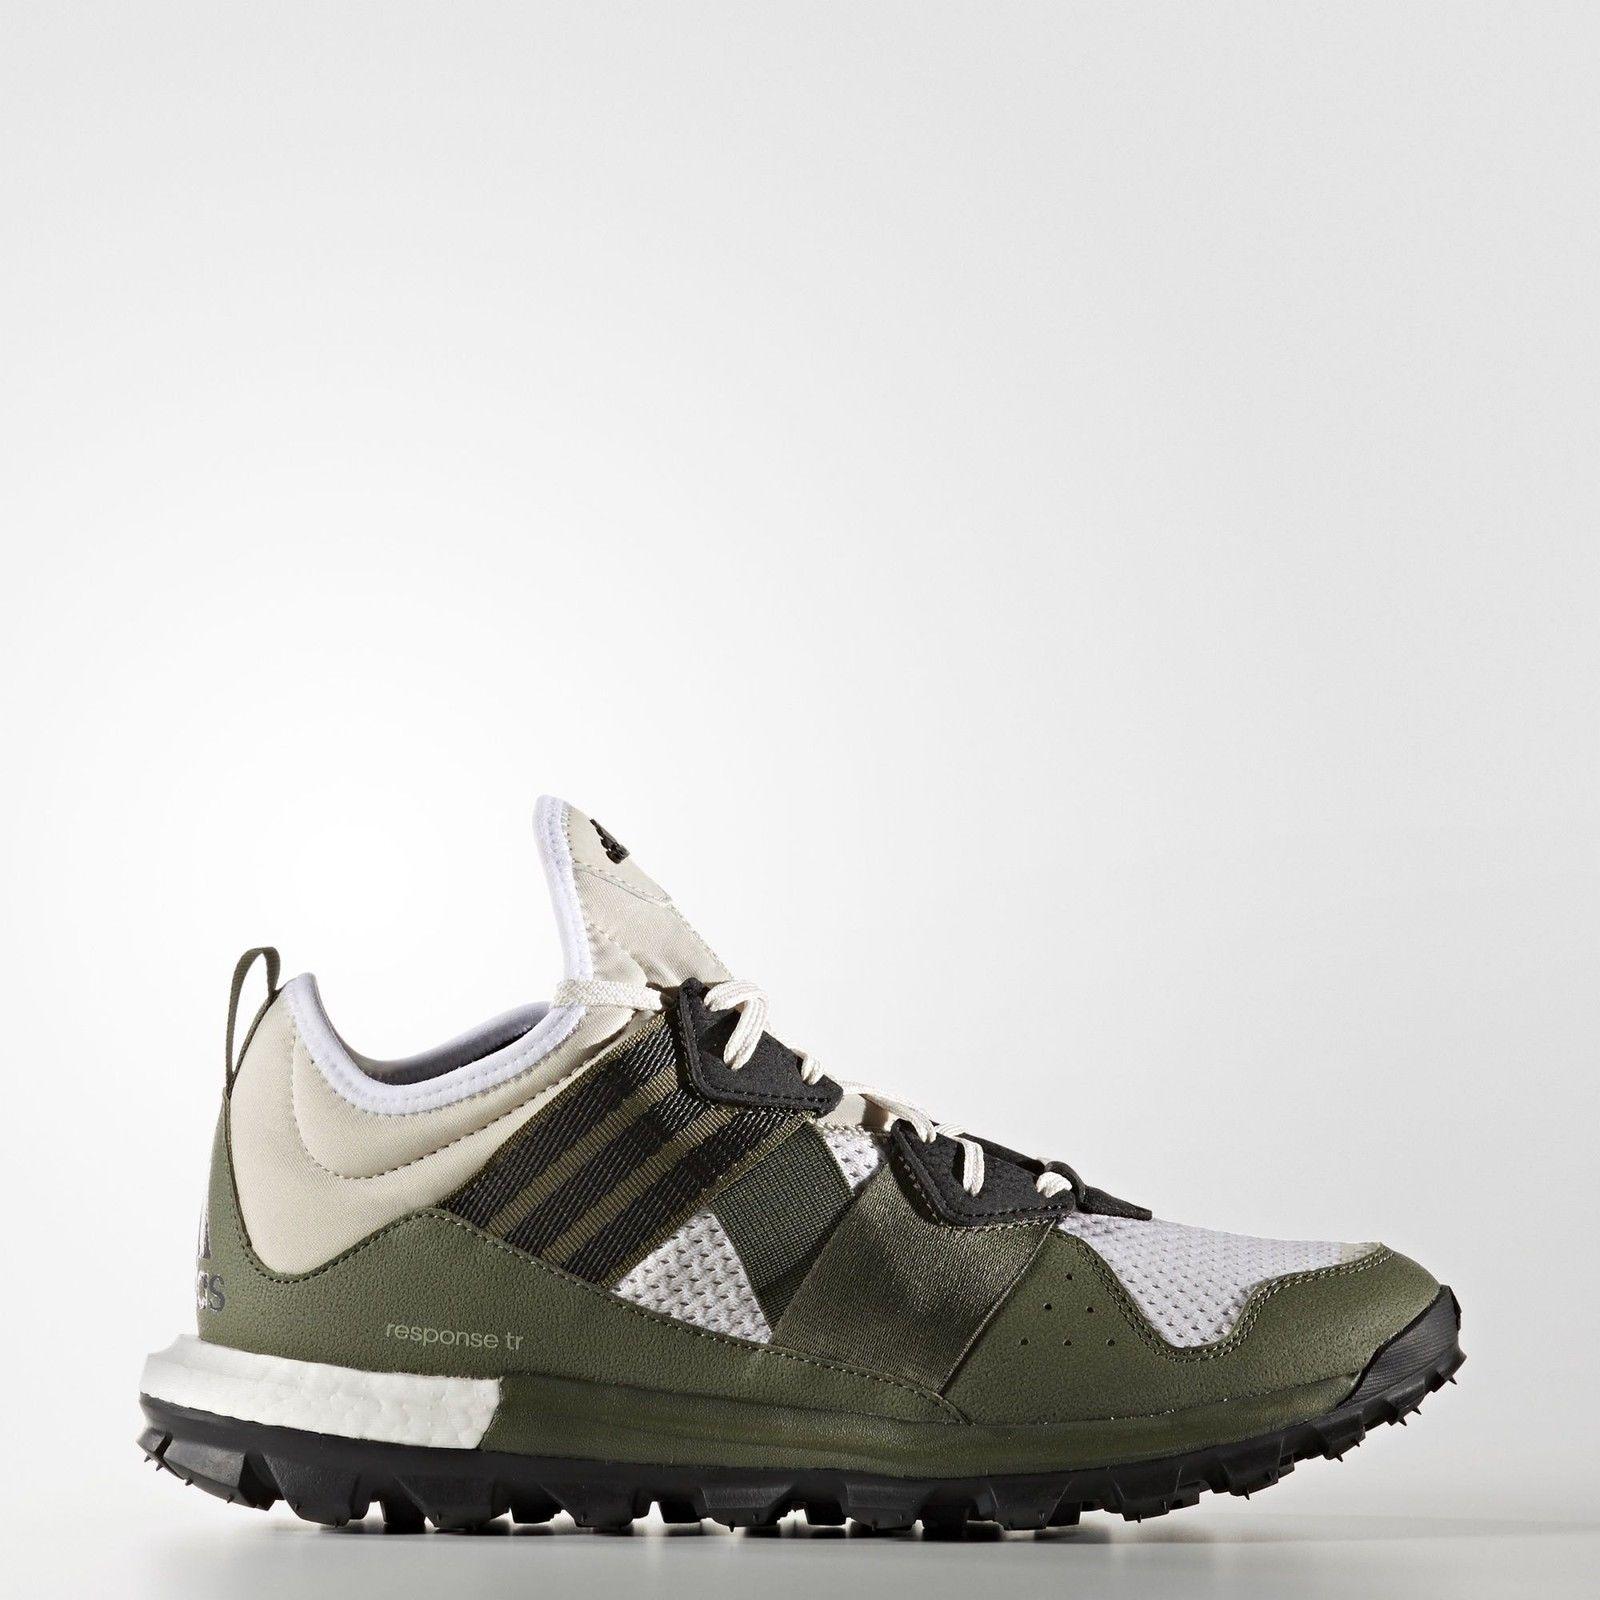 adidas 阿迪达斯 Response Boost 越野跑鞋